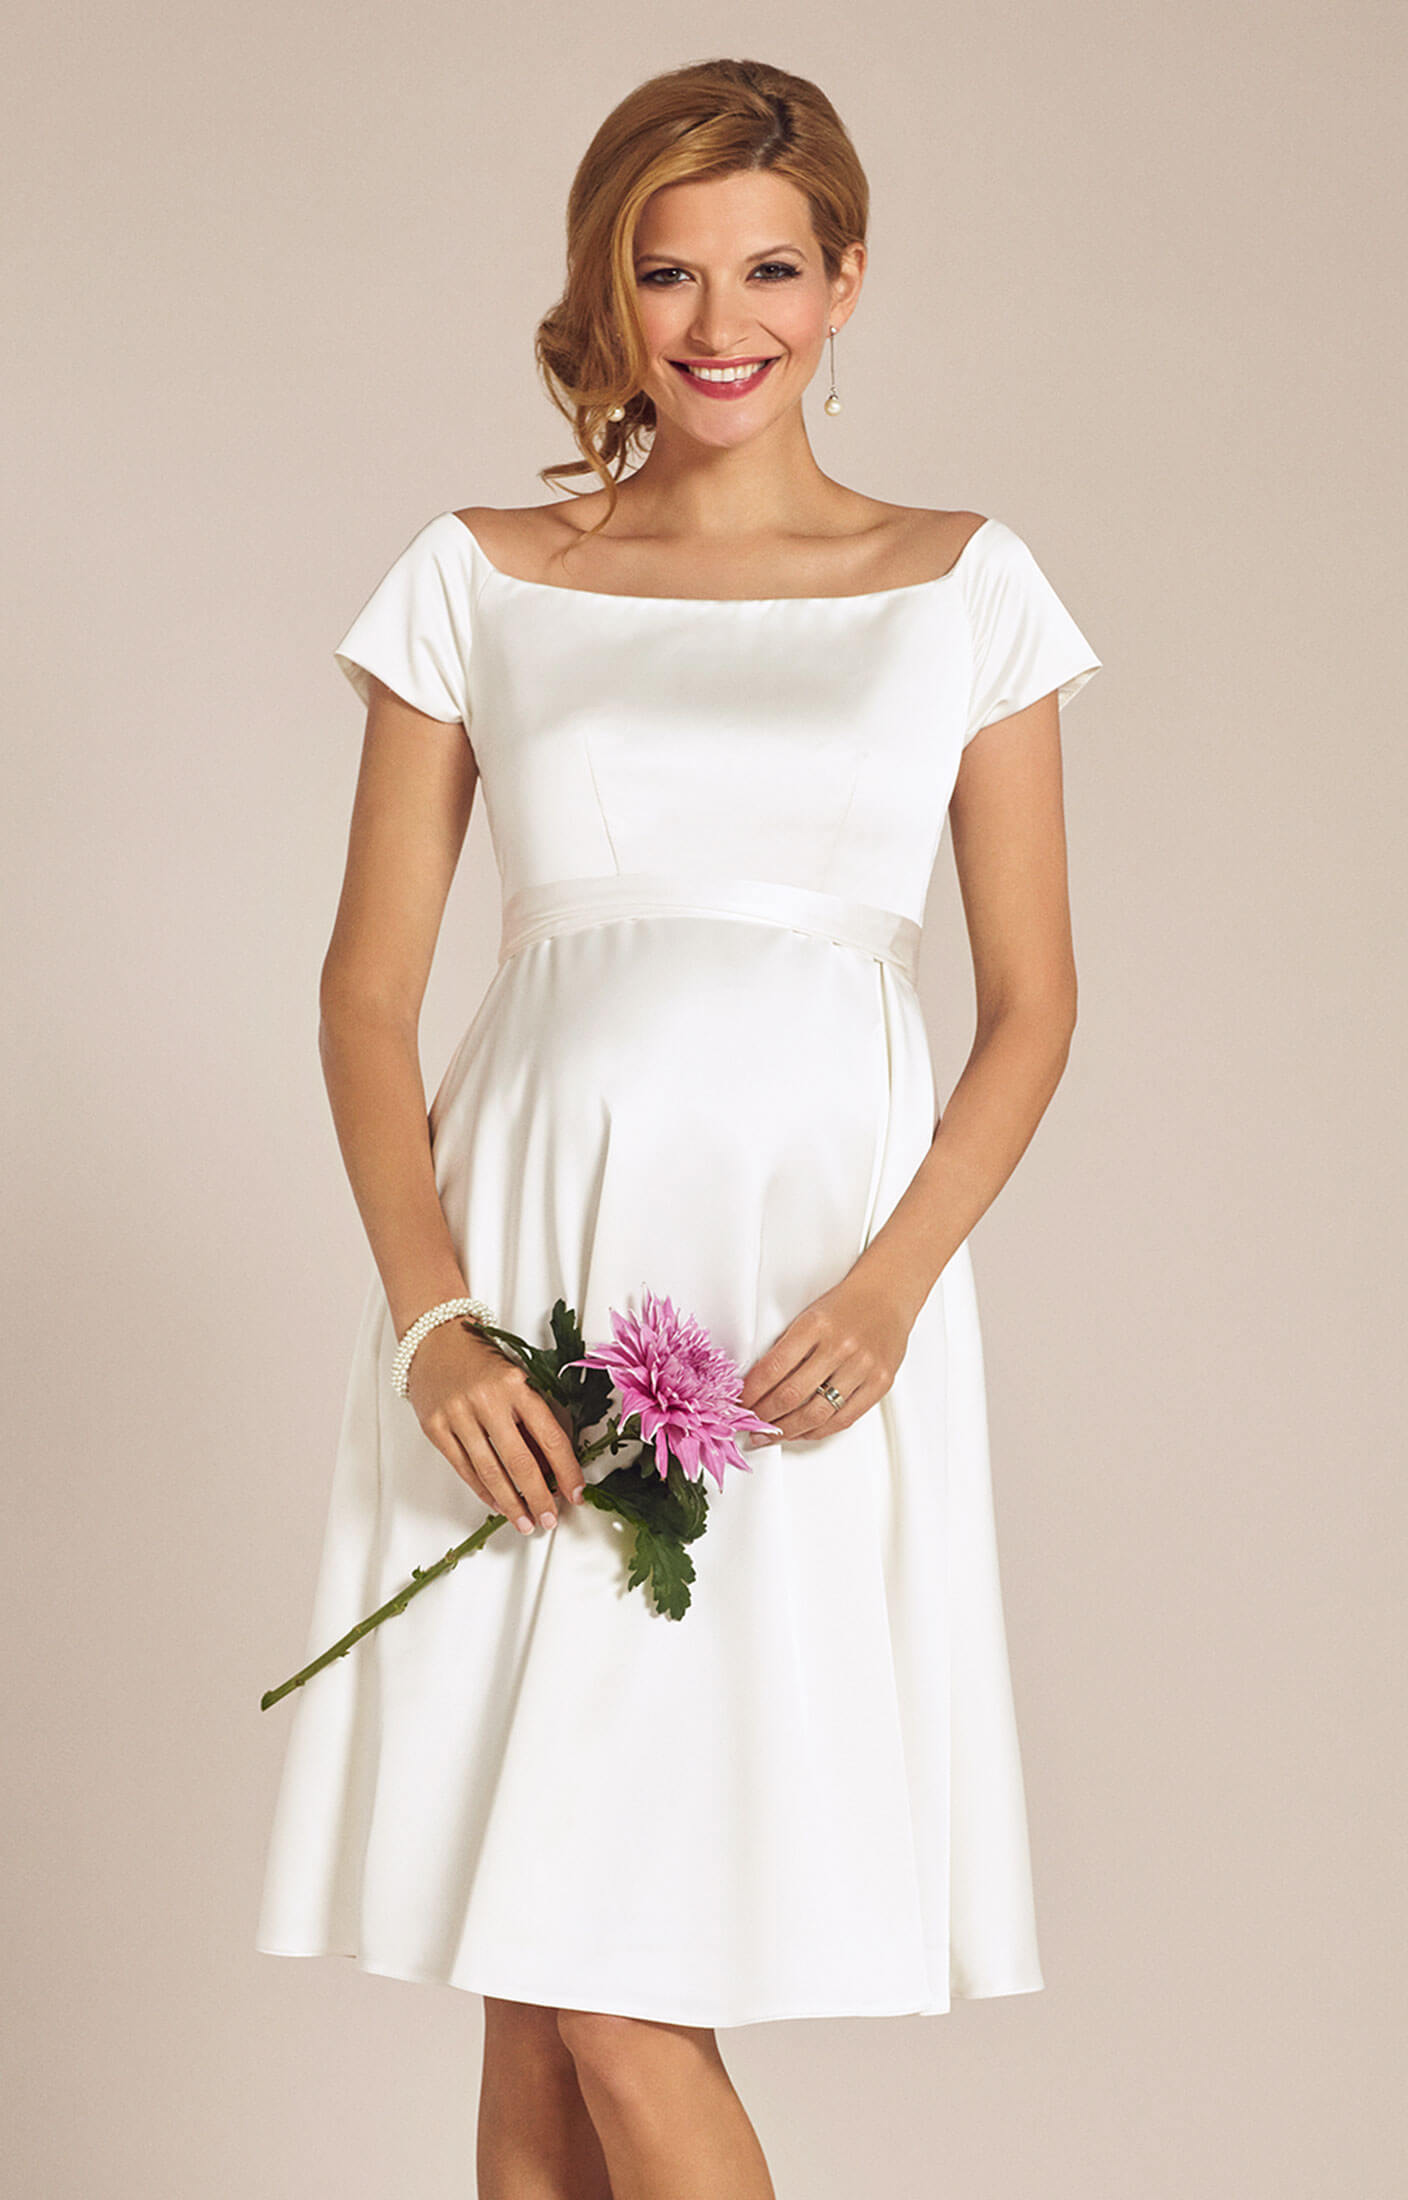 Aria maternity wedding dress ivory maternity wedding for Ivory maternity wedding dresses